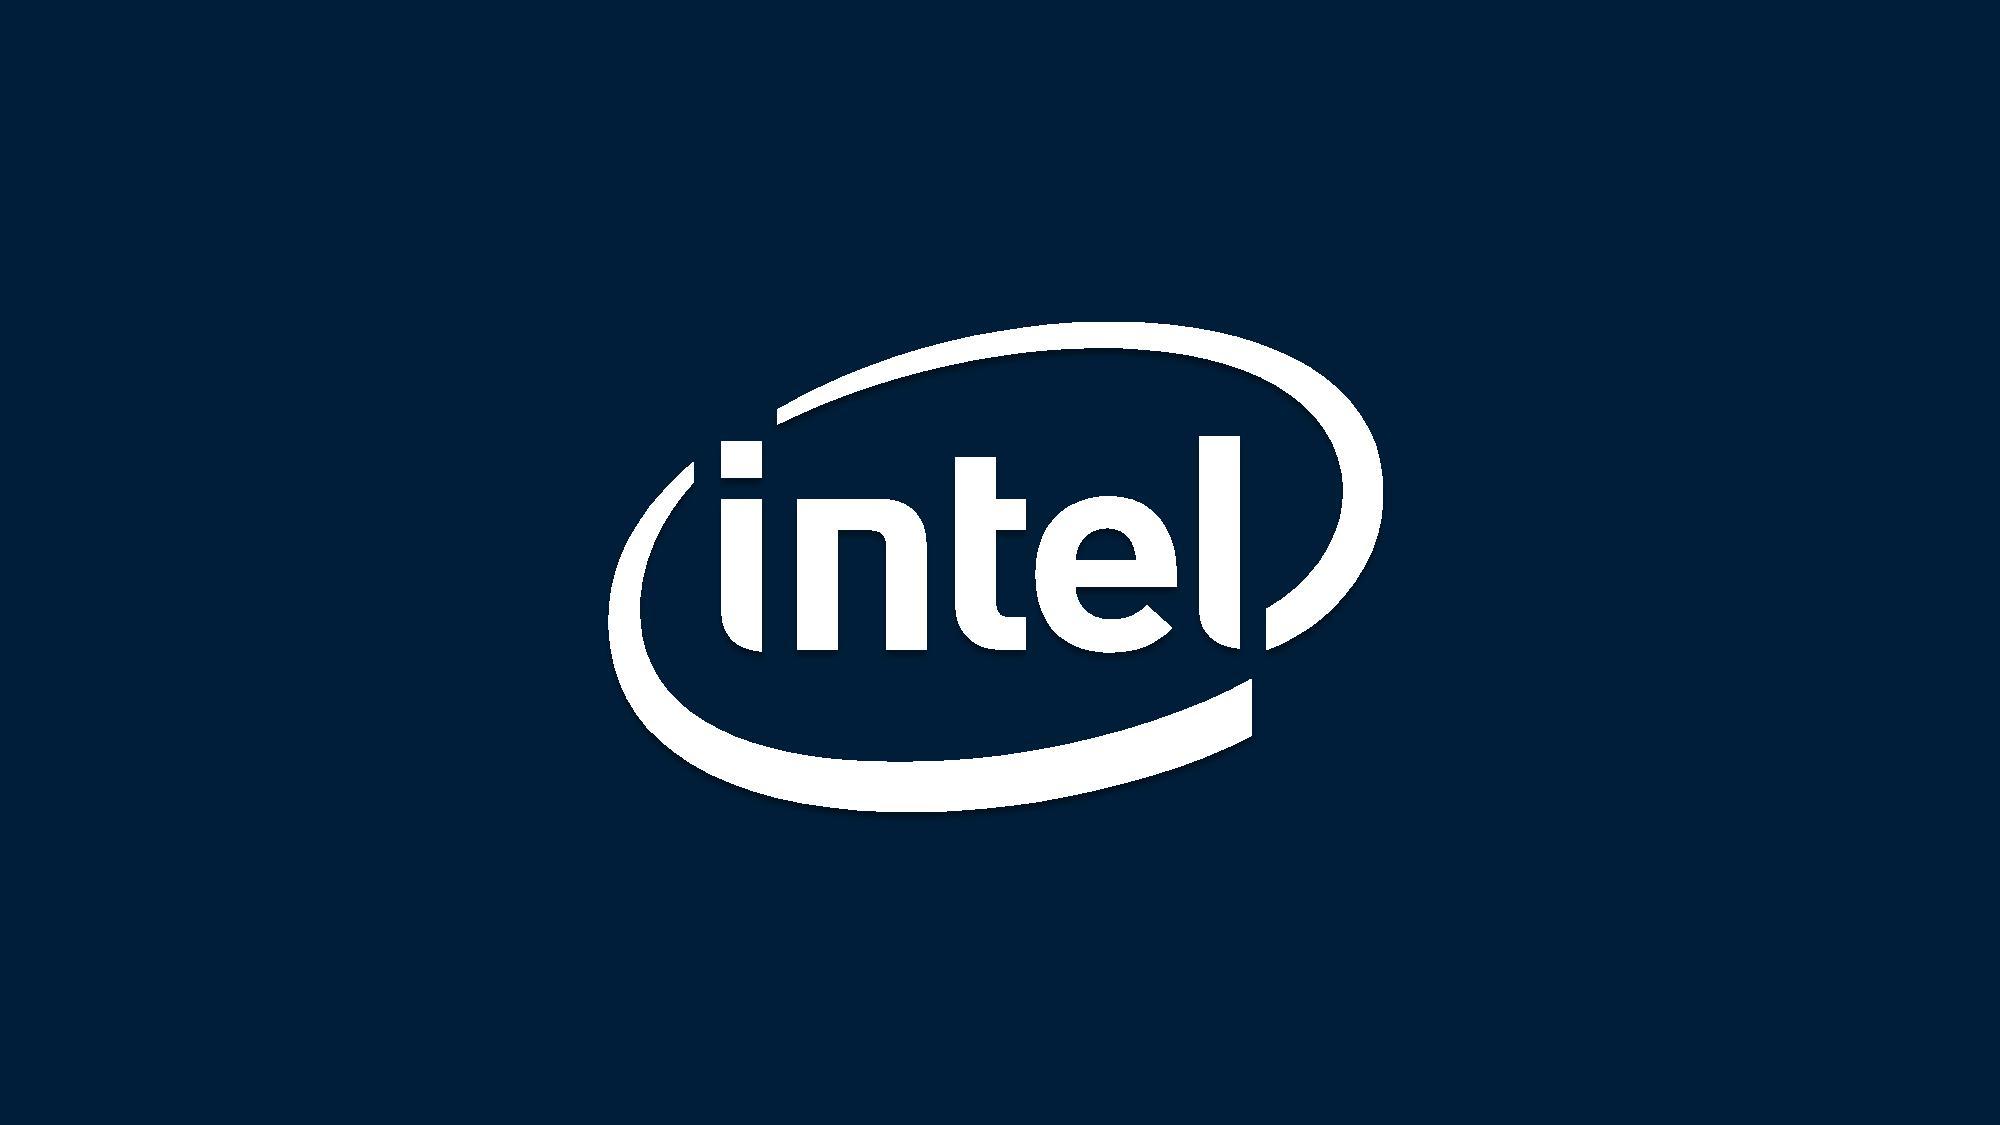 Intel Drops Financial Support for Congressman Steve King amid White Supremacist Endorsement